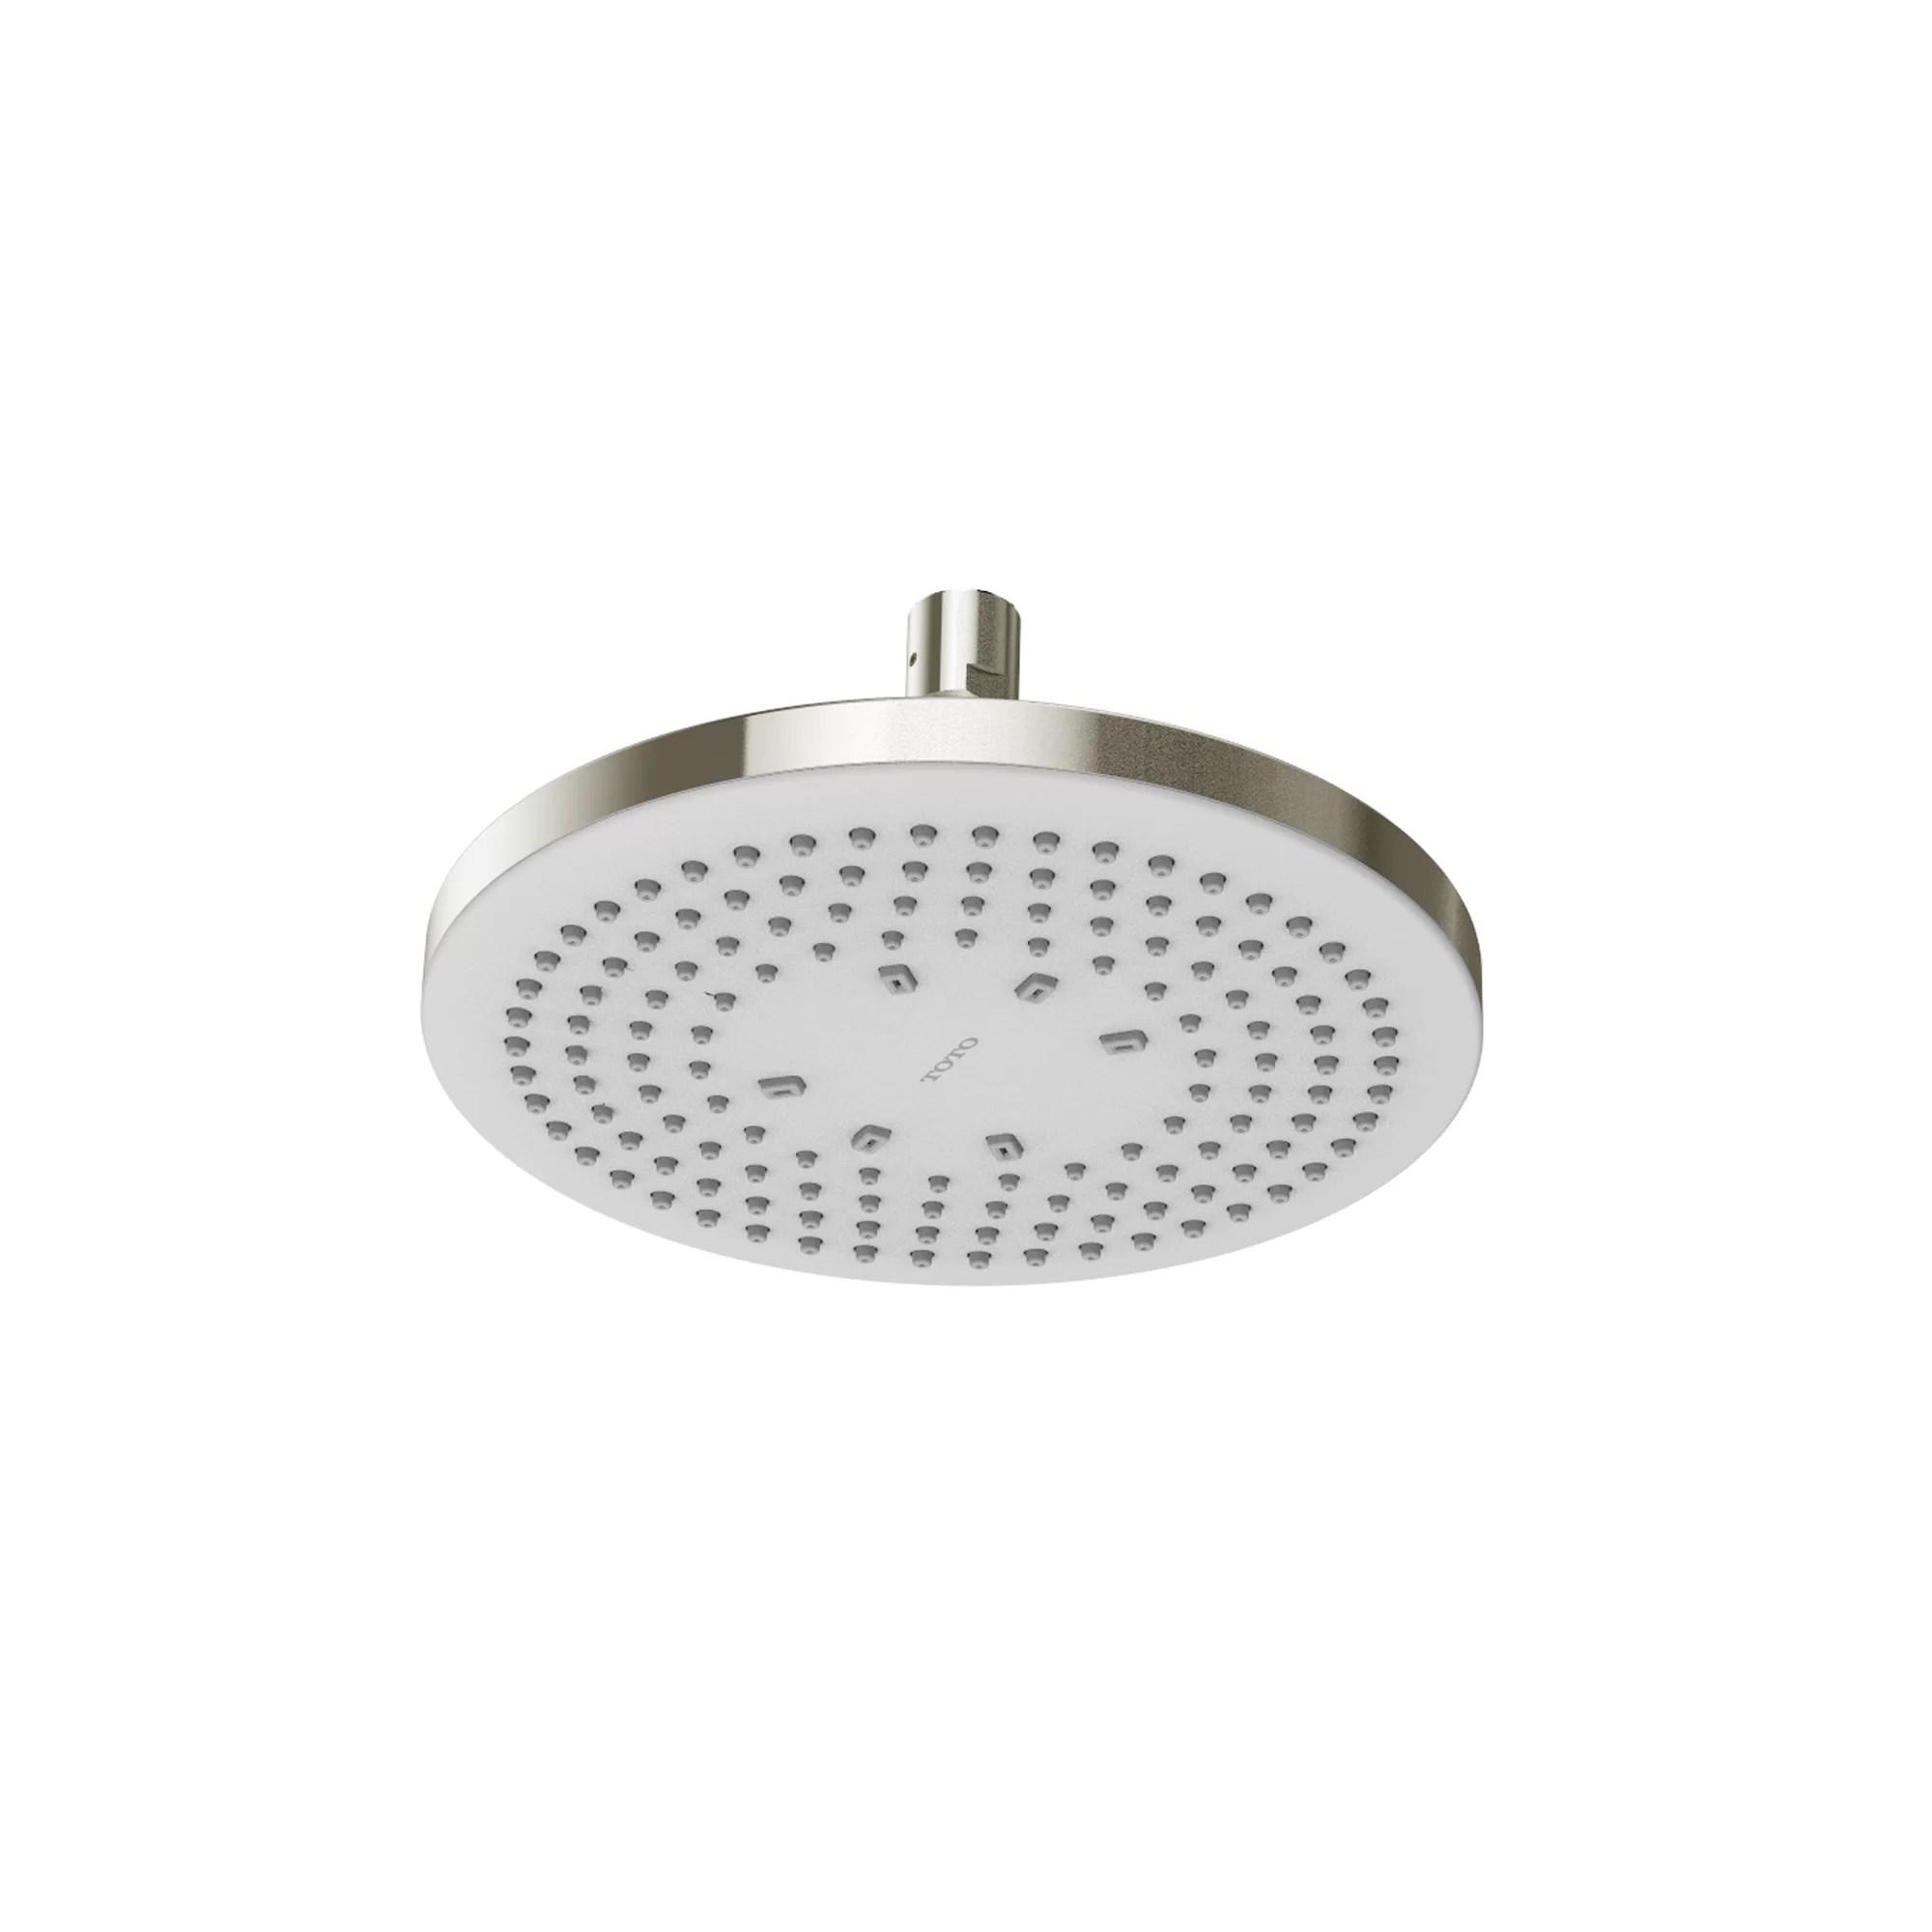 G Series Round Single Spray Rain Shower Head With Comfort Wave Technology